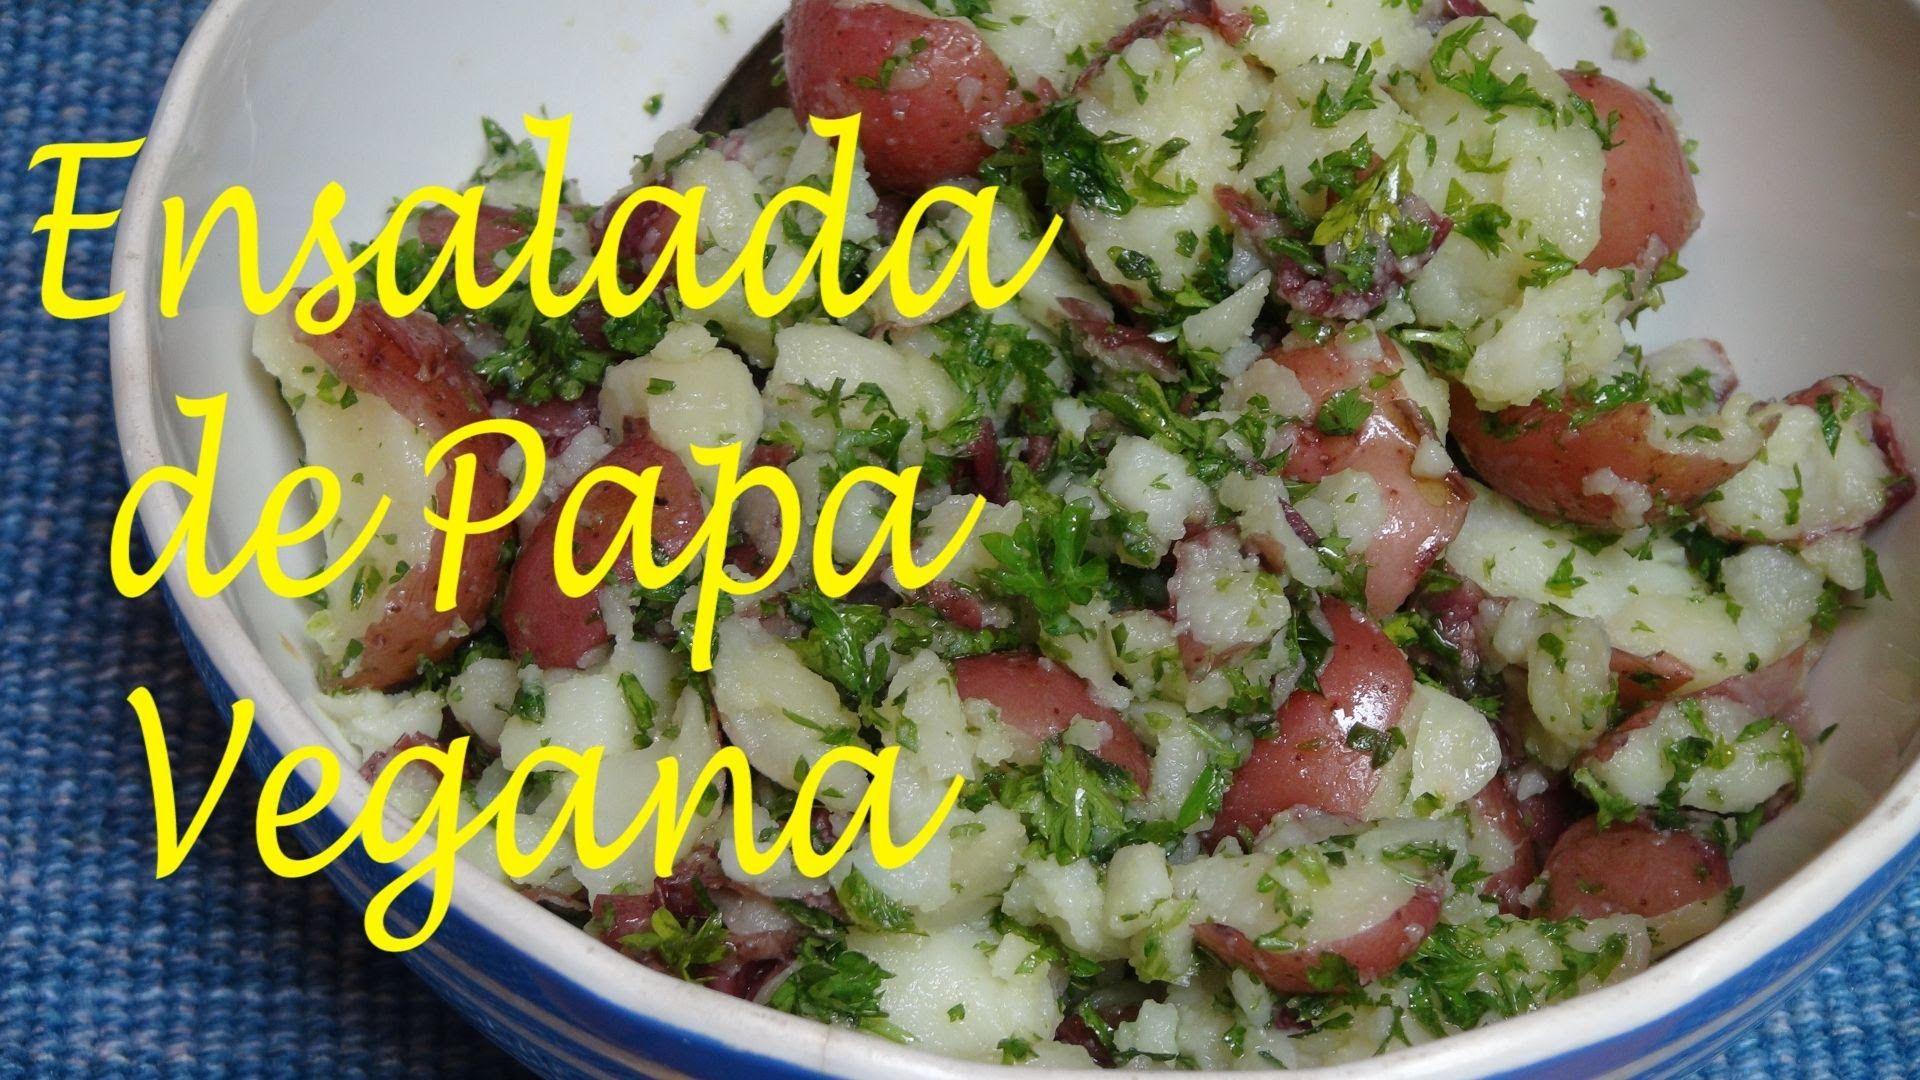 Ensalada de Papitas con Perejil - Receta Vegana